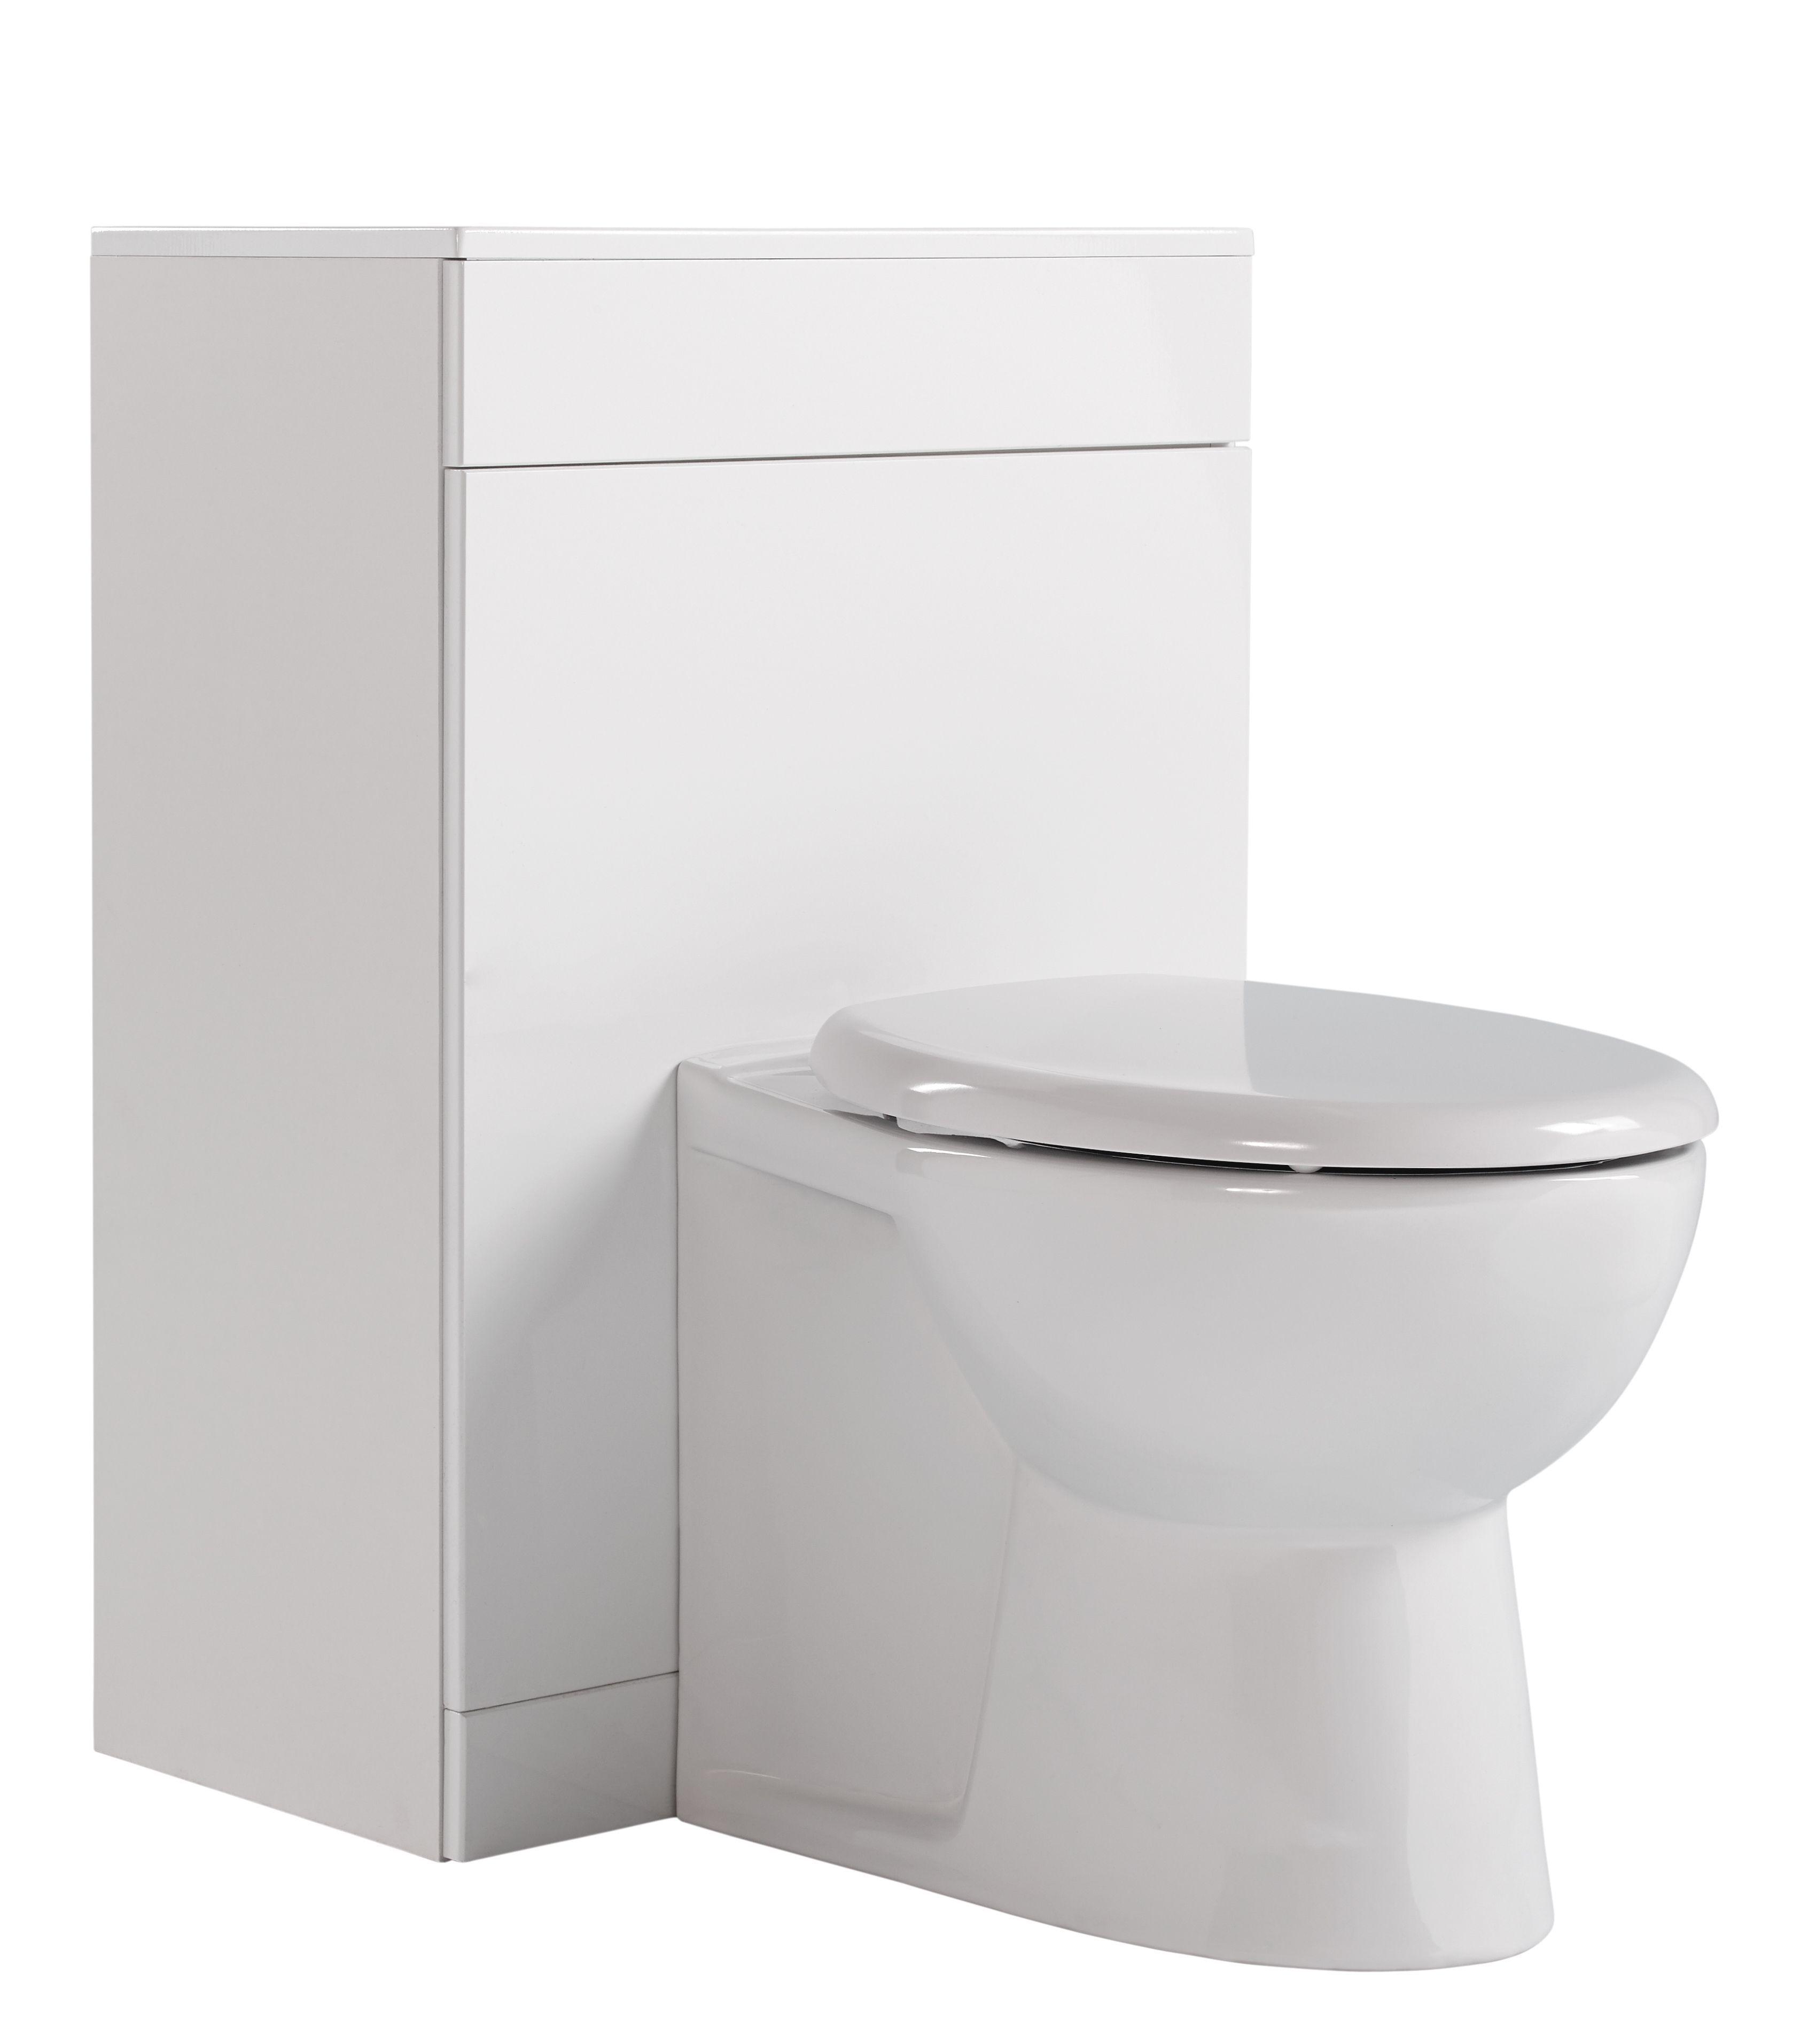 Pleasing Ardenno Gloss White Toilet Unit Wc Set Departments Diy At Bq Creativecarmelina Interior Chair Design Creativecarmelinacom